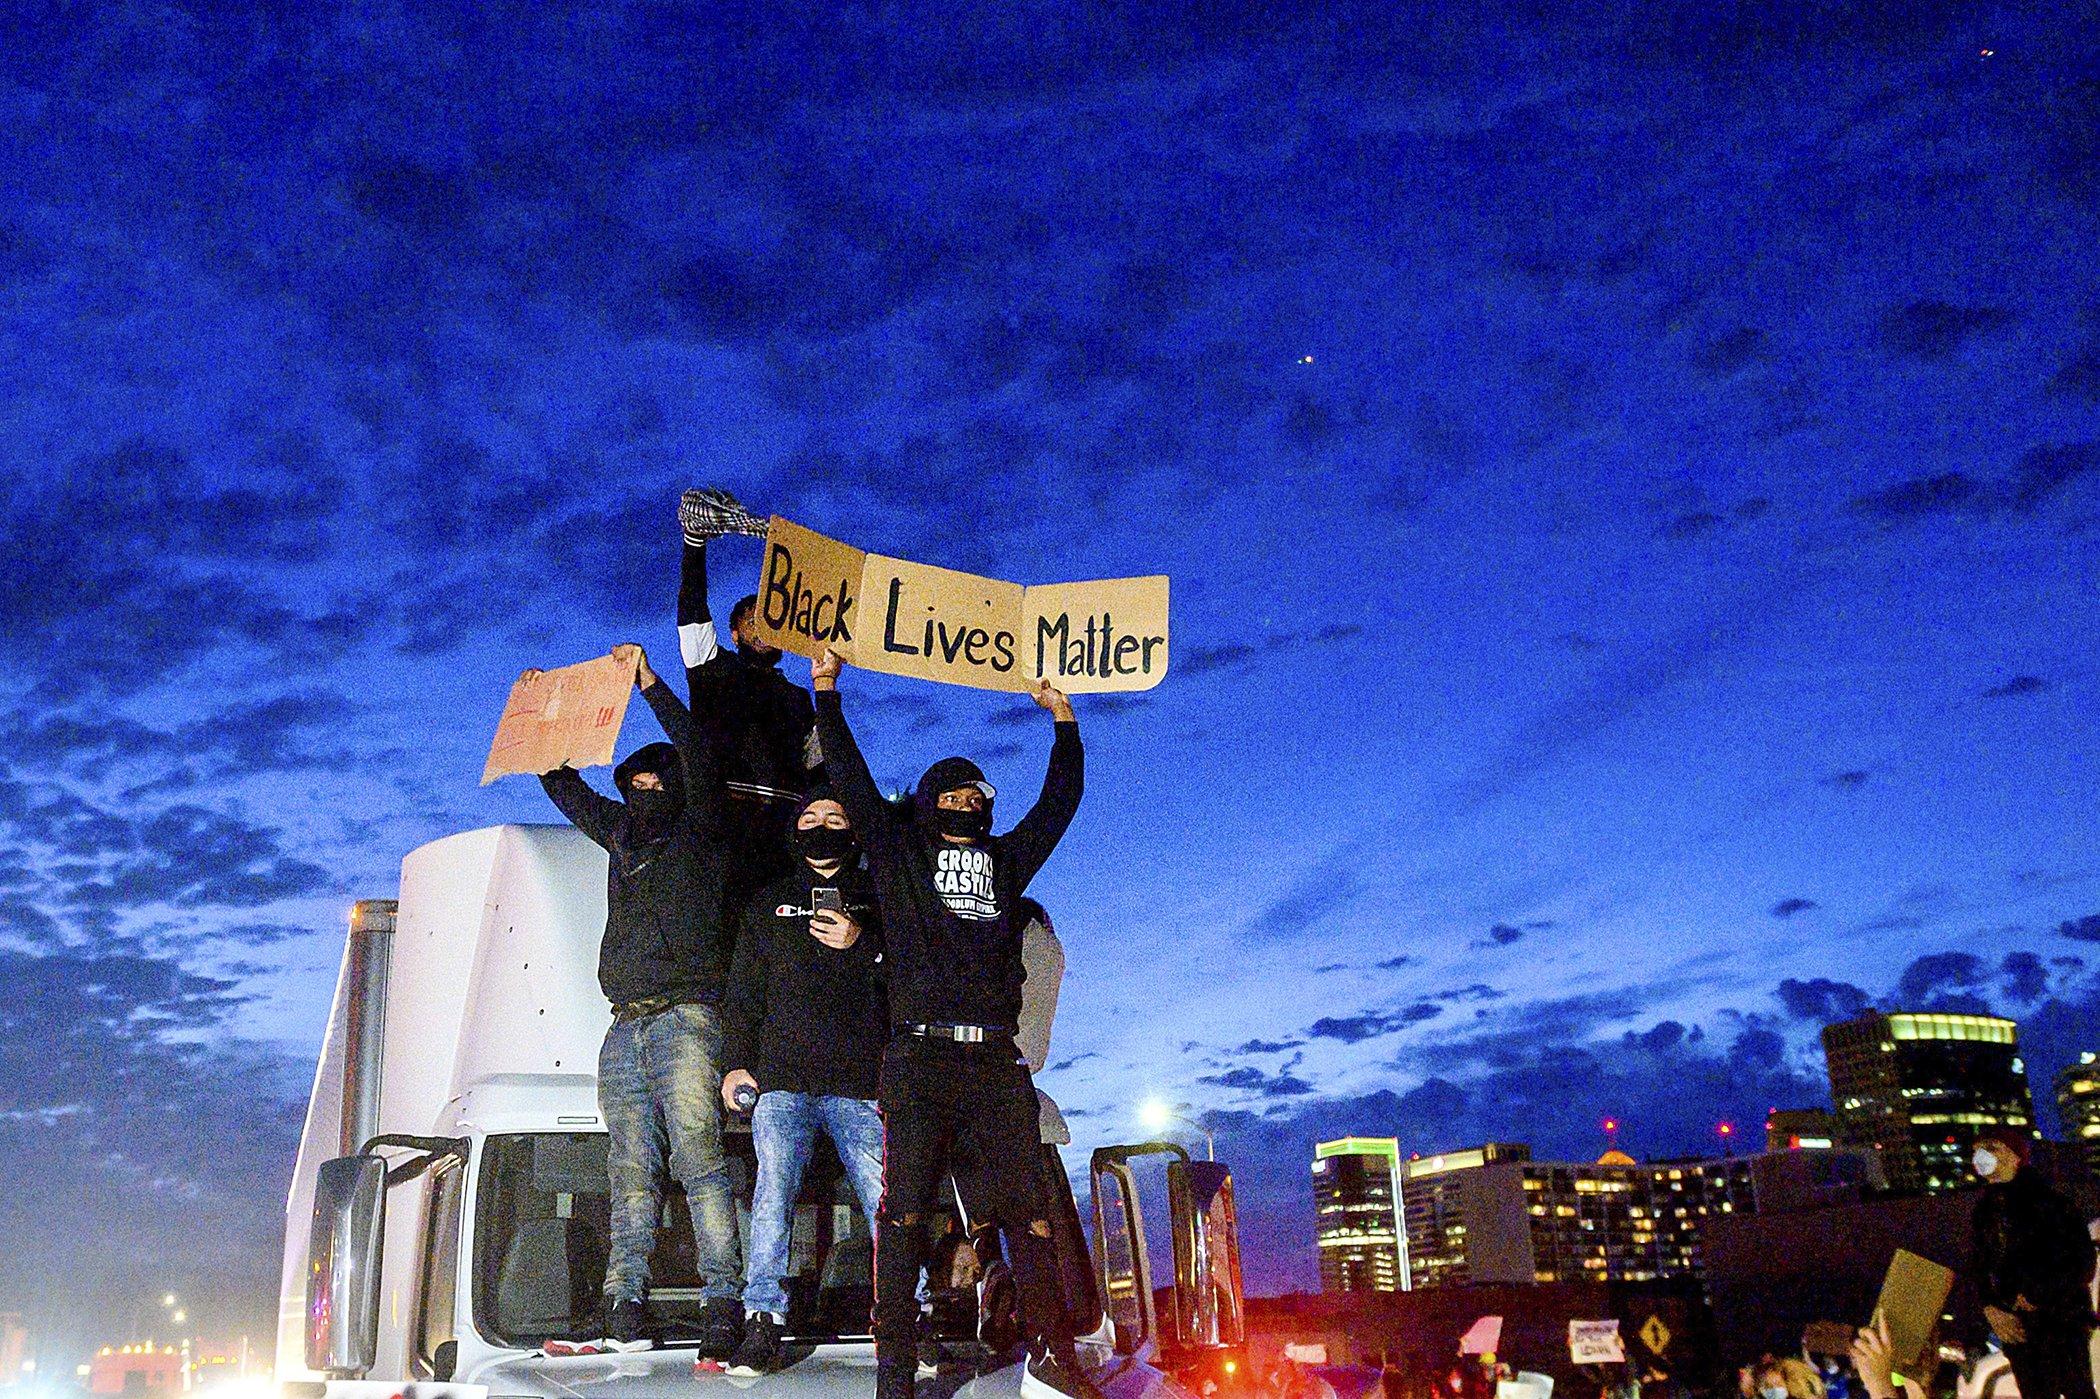 George-Floyd-Protests-Activism-Social-Justice-002.jpg